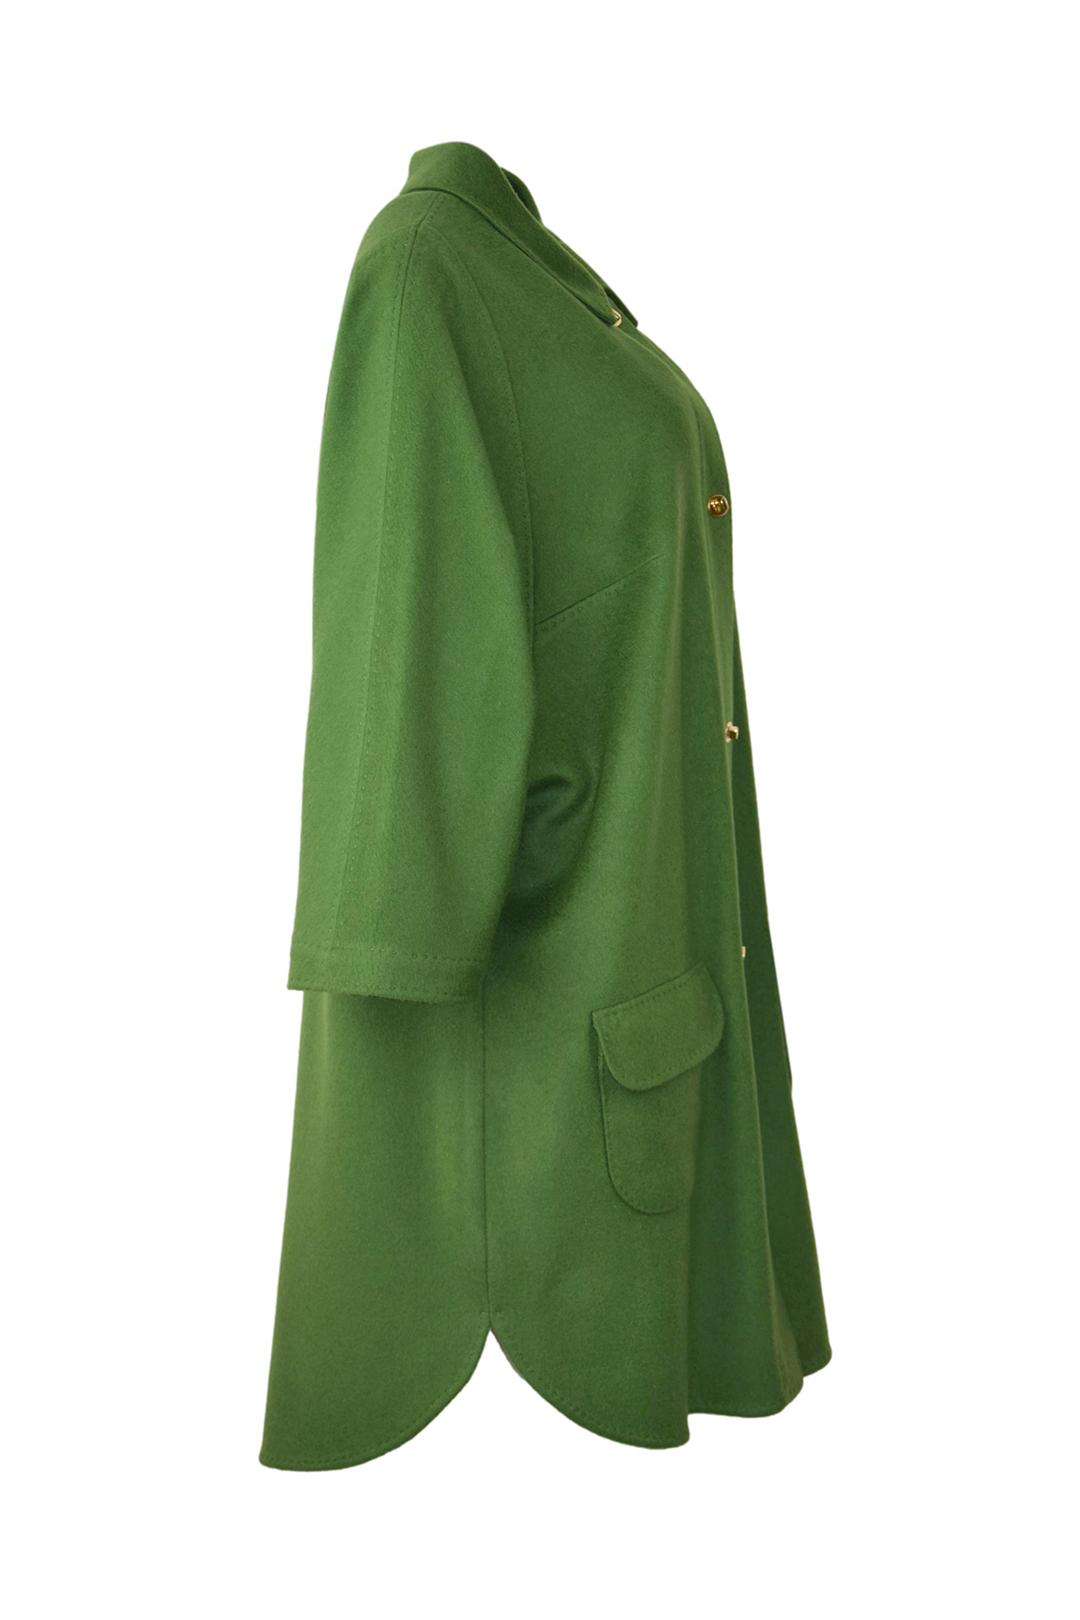 Mantel in T-Cut-Style mit vergoldeten Drehverschlüssen, 100% Kaschmir